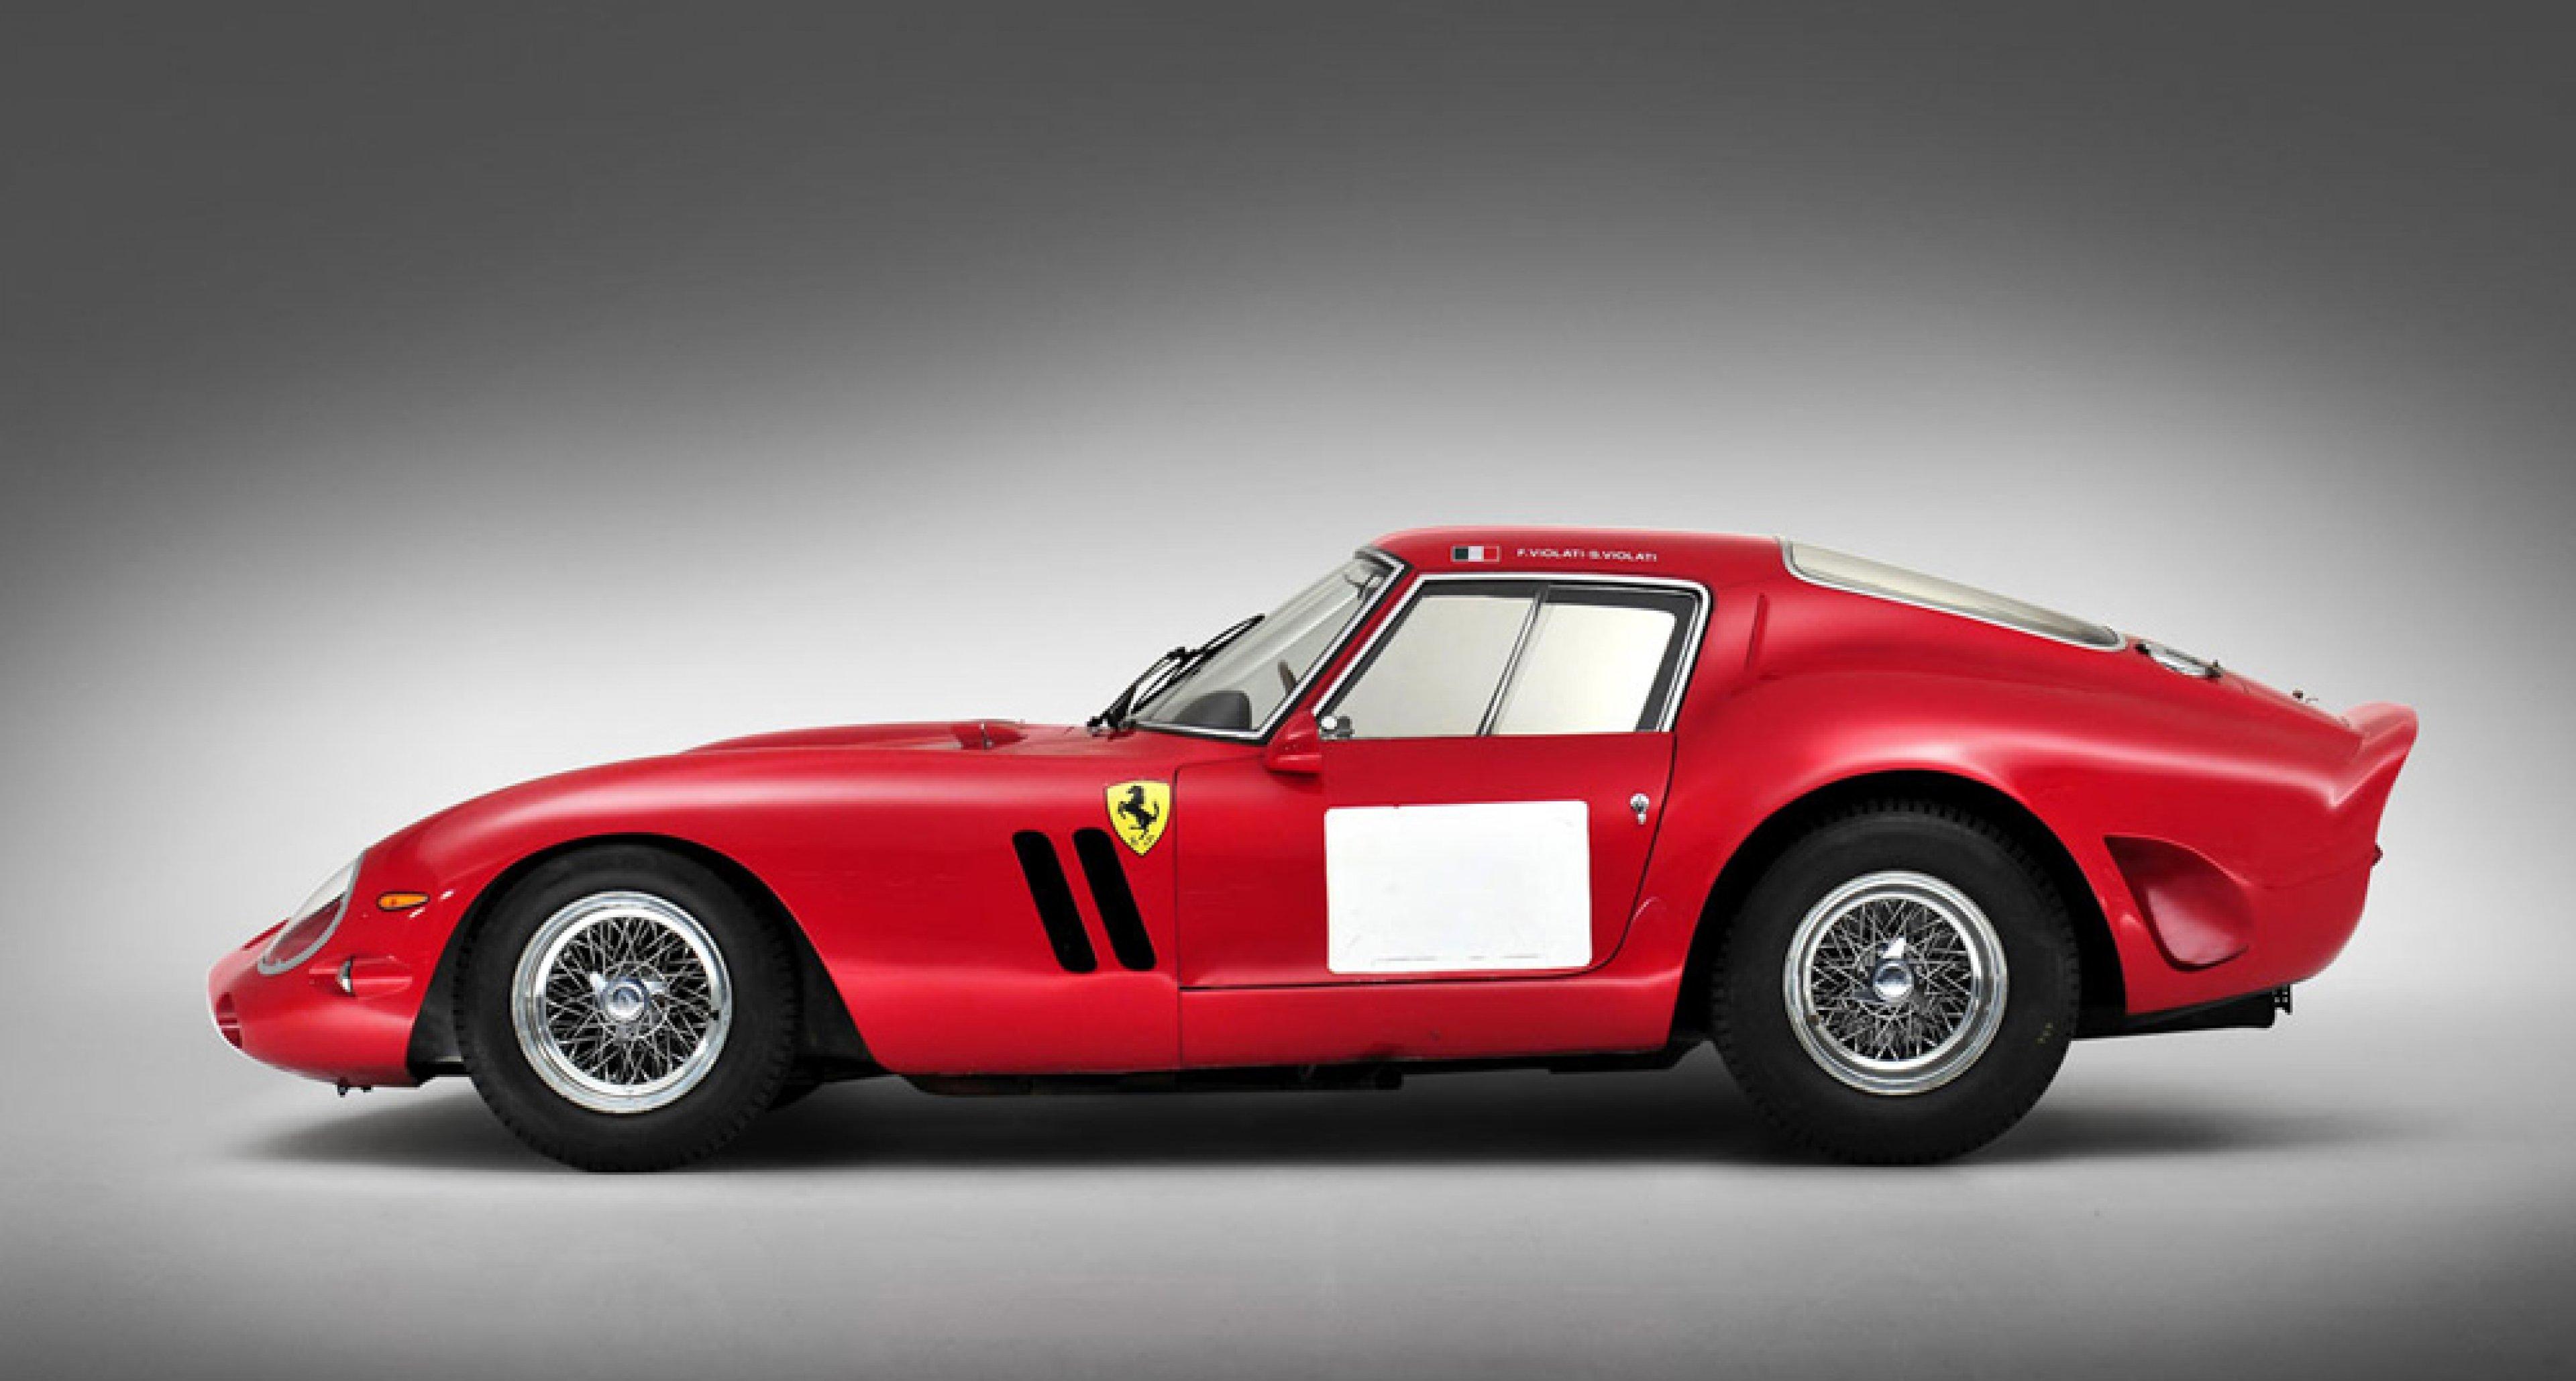 1962 Ferrari 250 GTO, sold by Bonhams in August 2014 for $ 38,115,000.